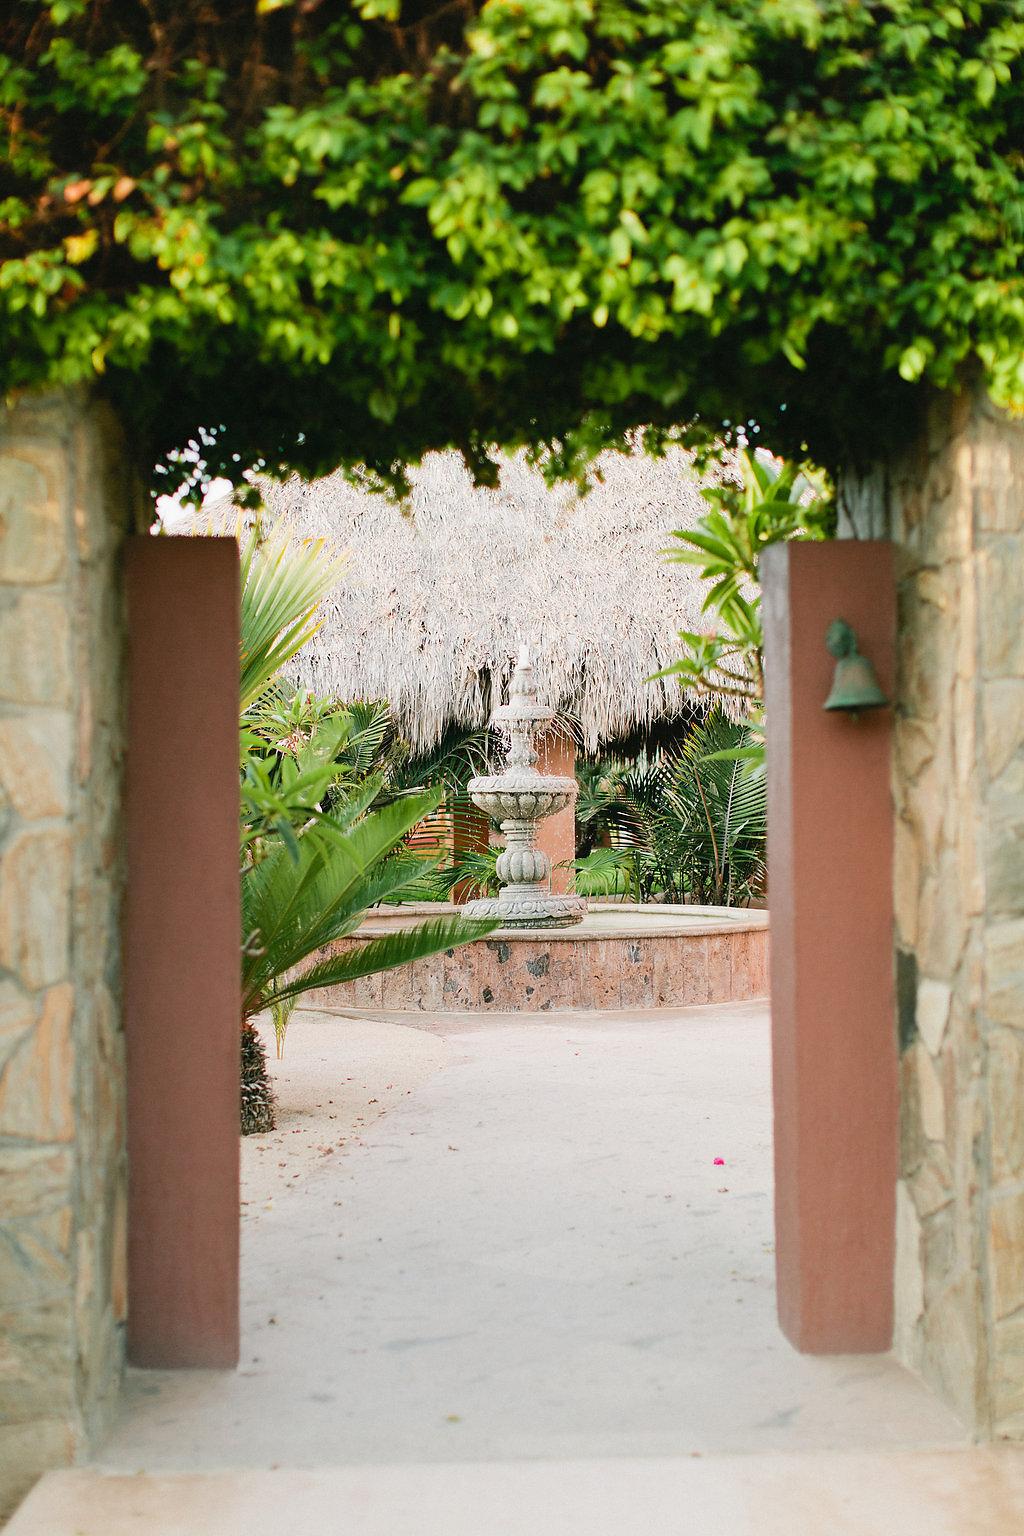 Rancho Pescadero | B.C.S, Mexico